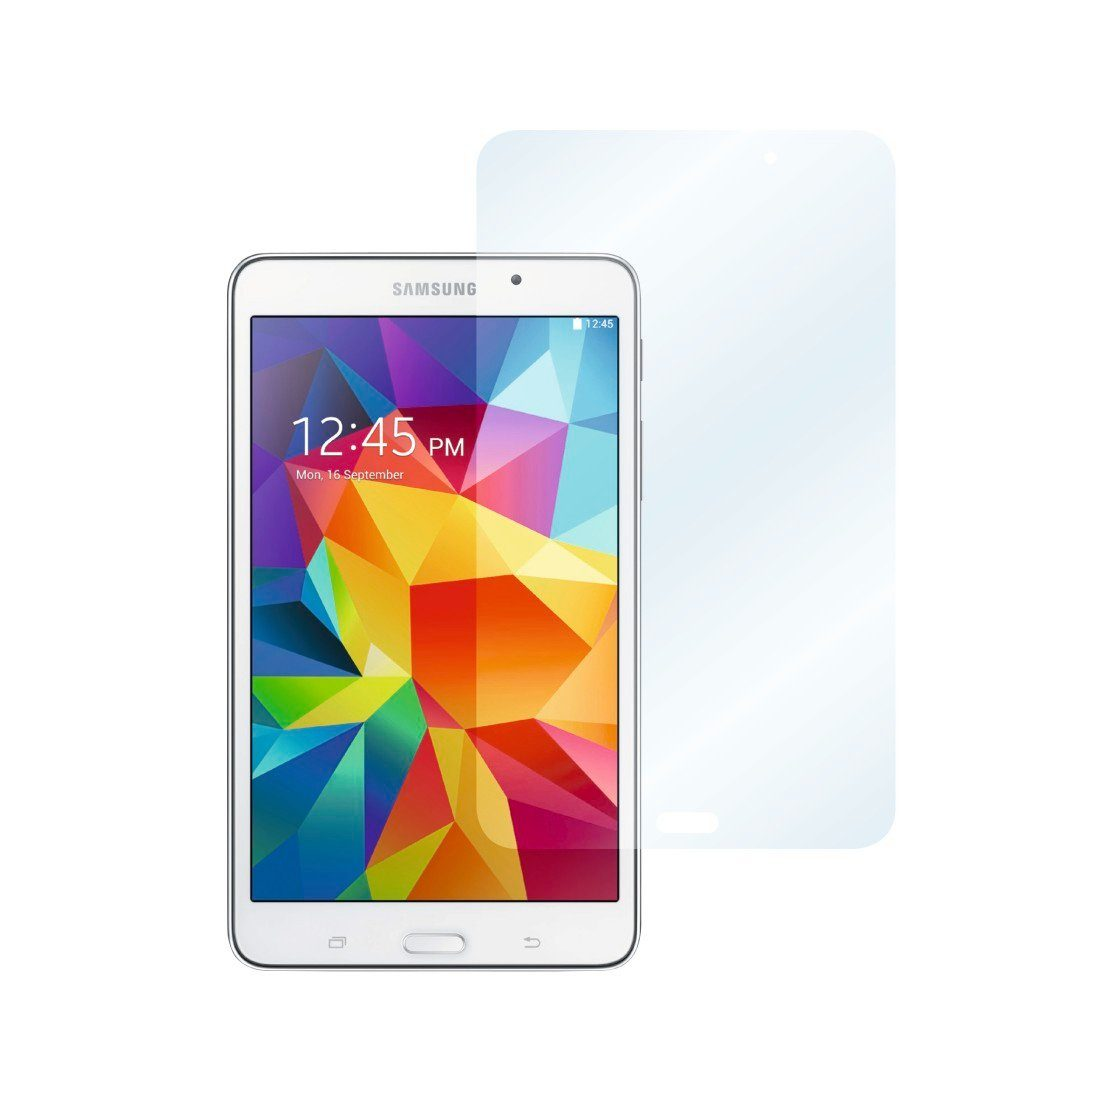 Hama Displayschutzfolie Anti-reflective für Samsung Galaxy Tab 4 7.0